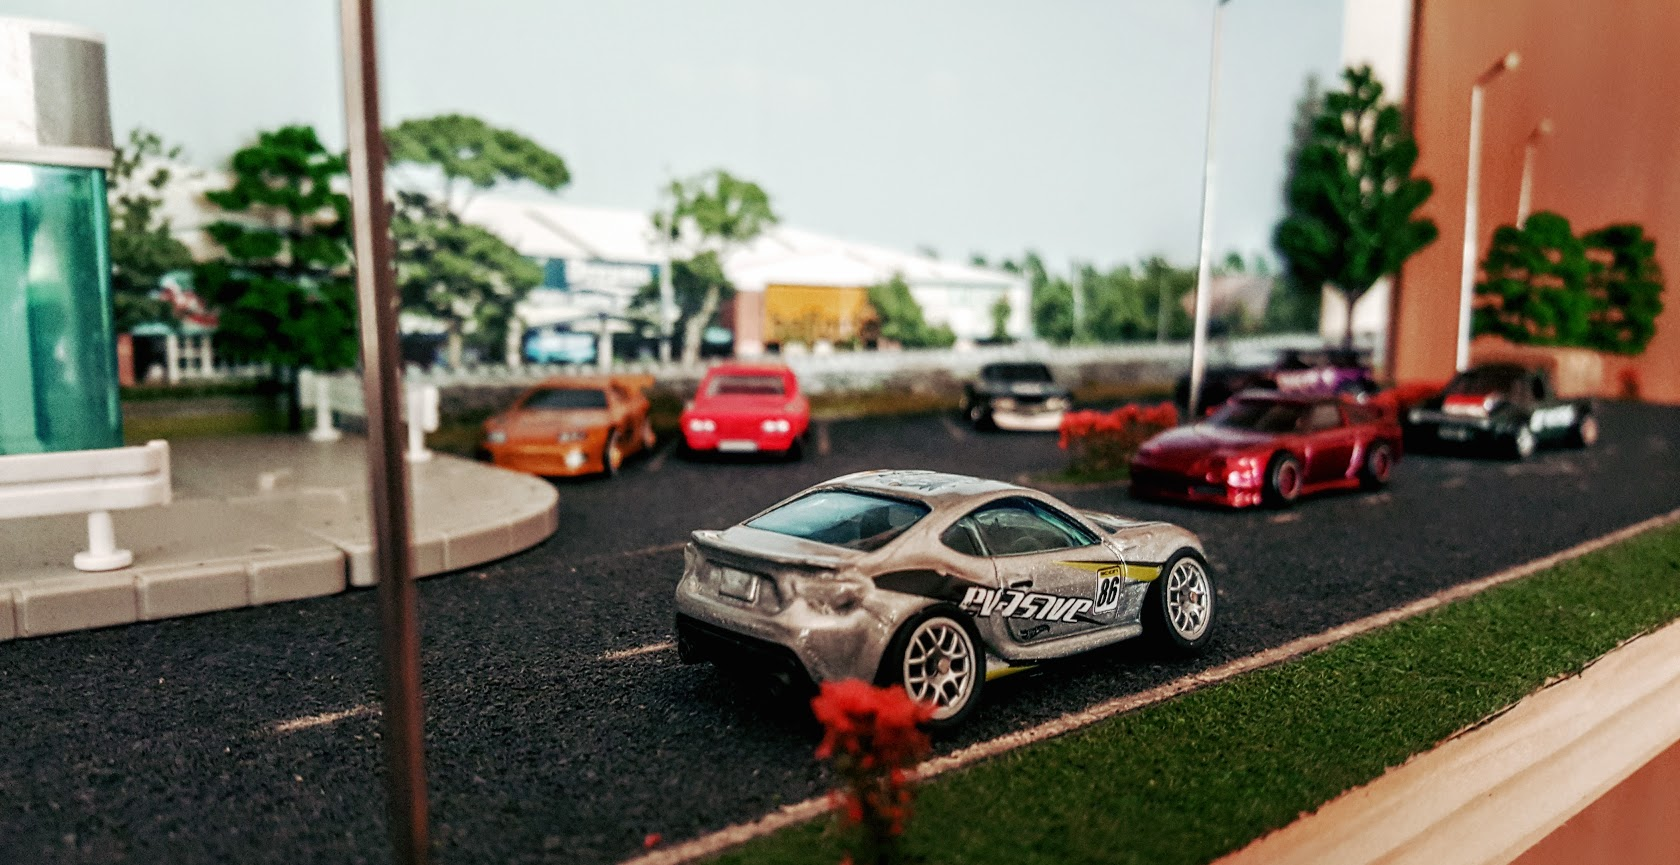 Car Möbel Shop how to a 1 64 scale diorama hotwheels diecast cars